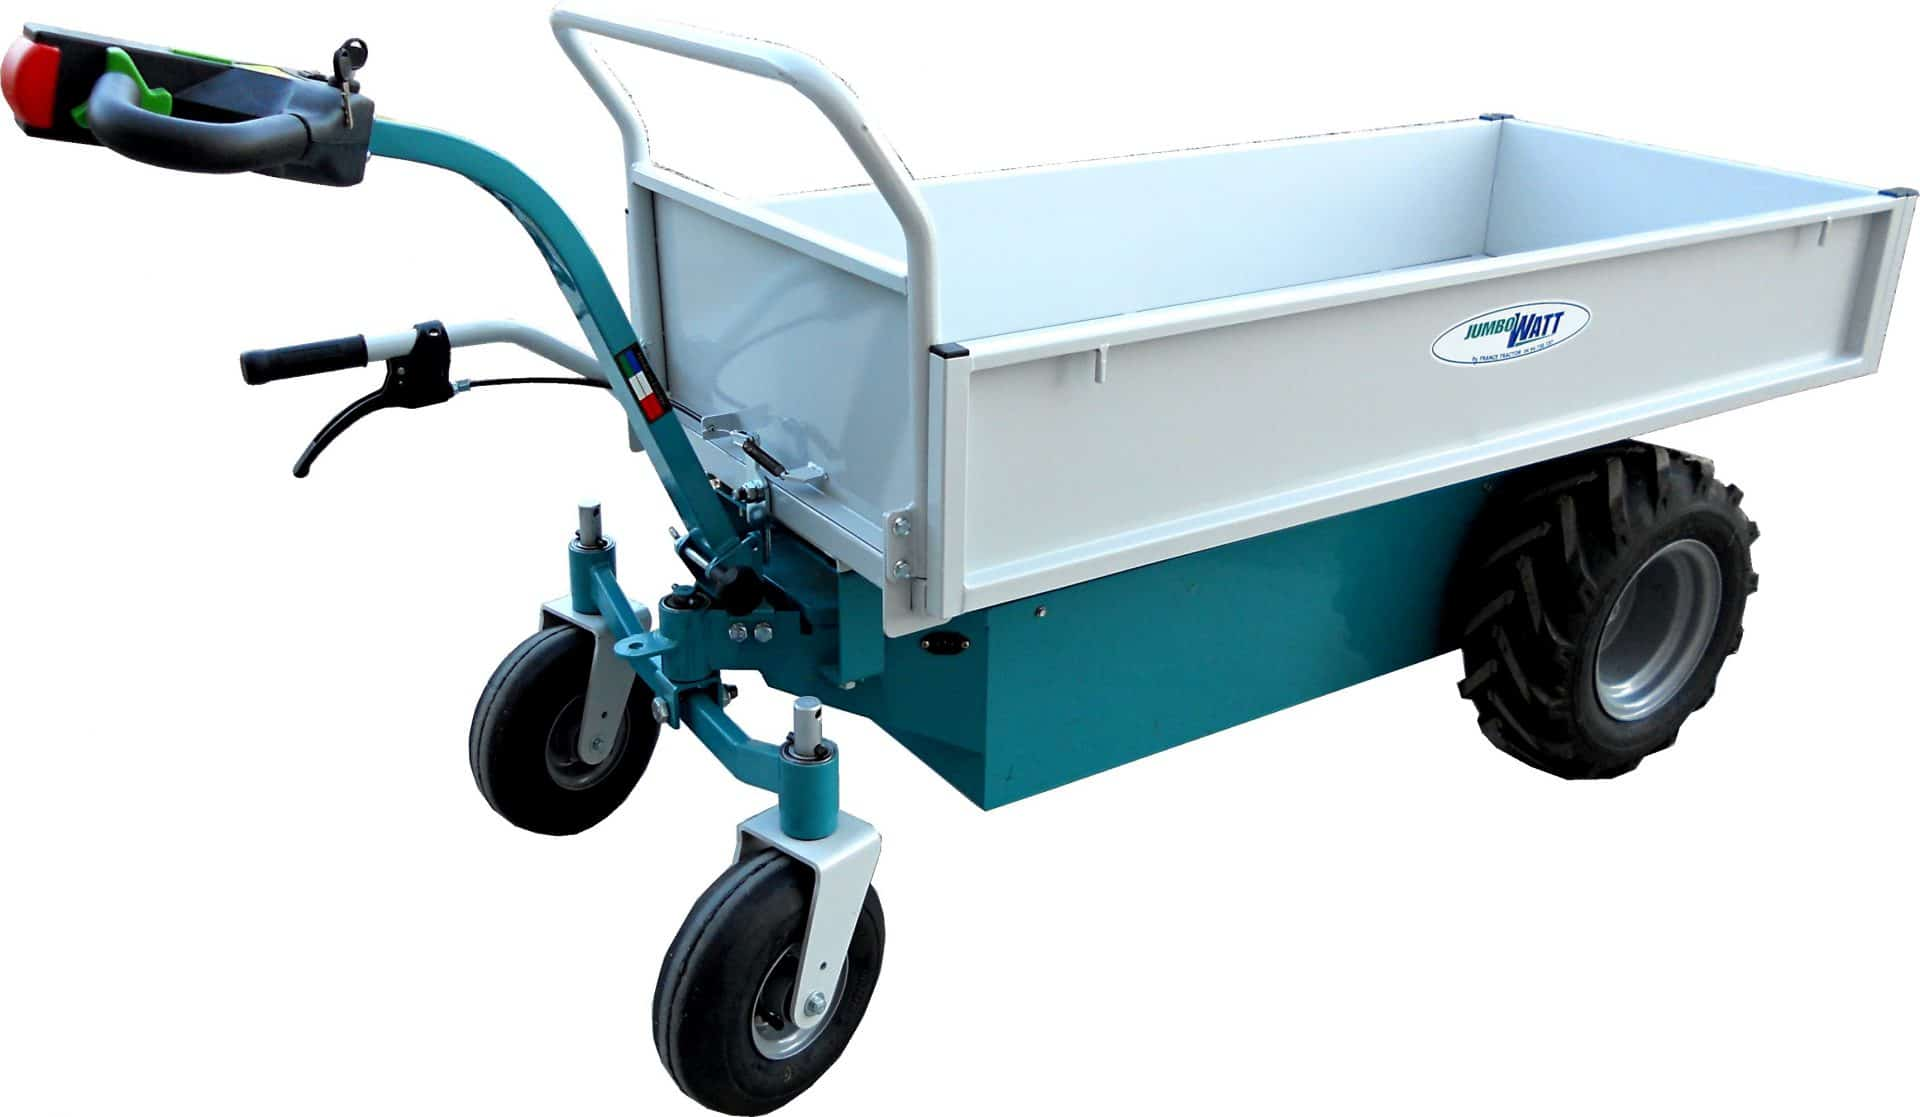 plateau ridelles 140 cm france tractor. Black Bedroom Furniture Sets. Home Design Ideas